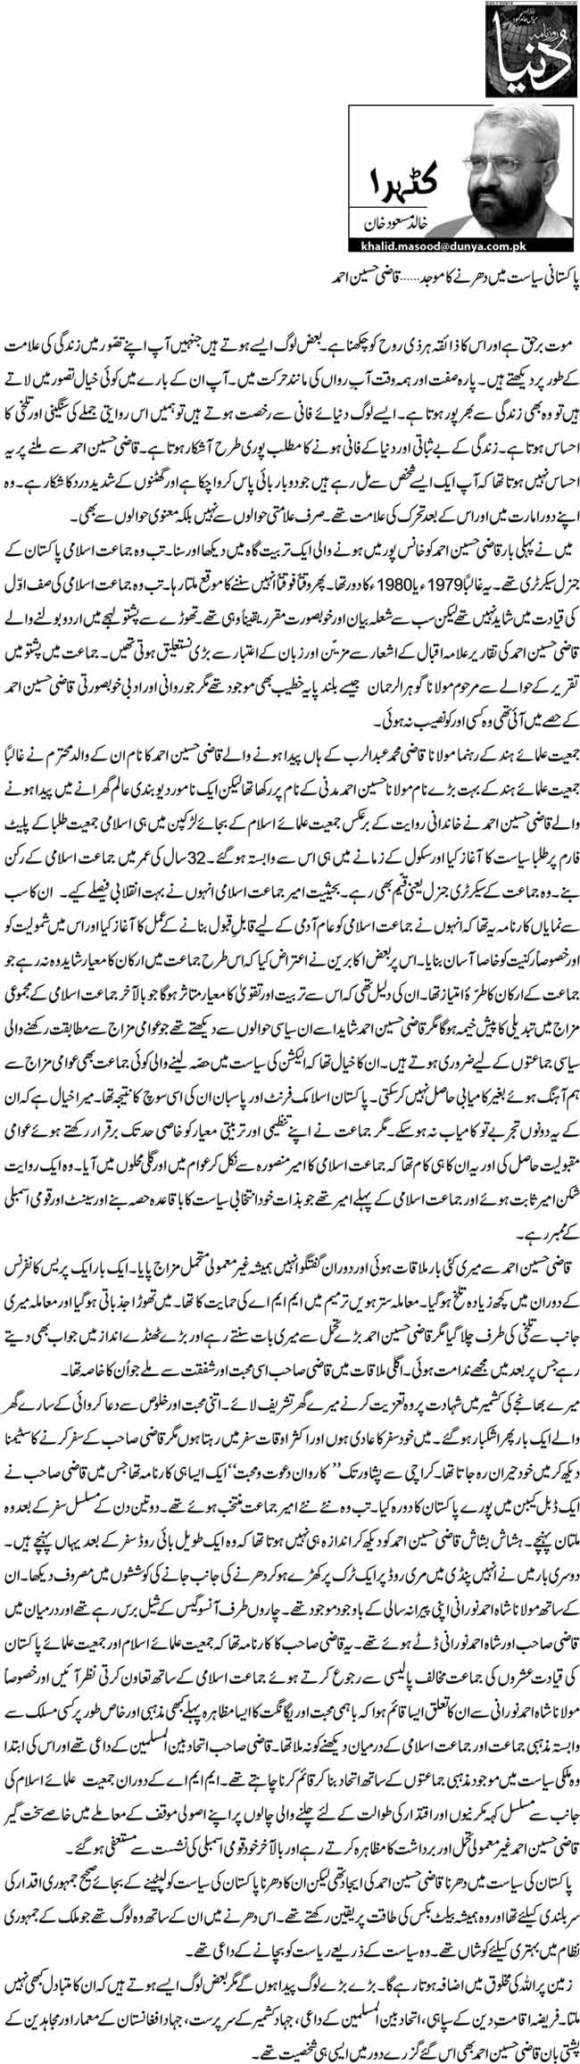 Pakistani siyasat main dharnay ka mojid... Qazi Hussain Ahmed - Khalid Masood Khan